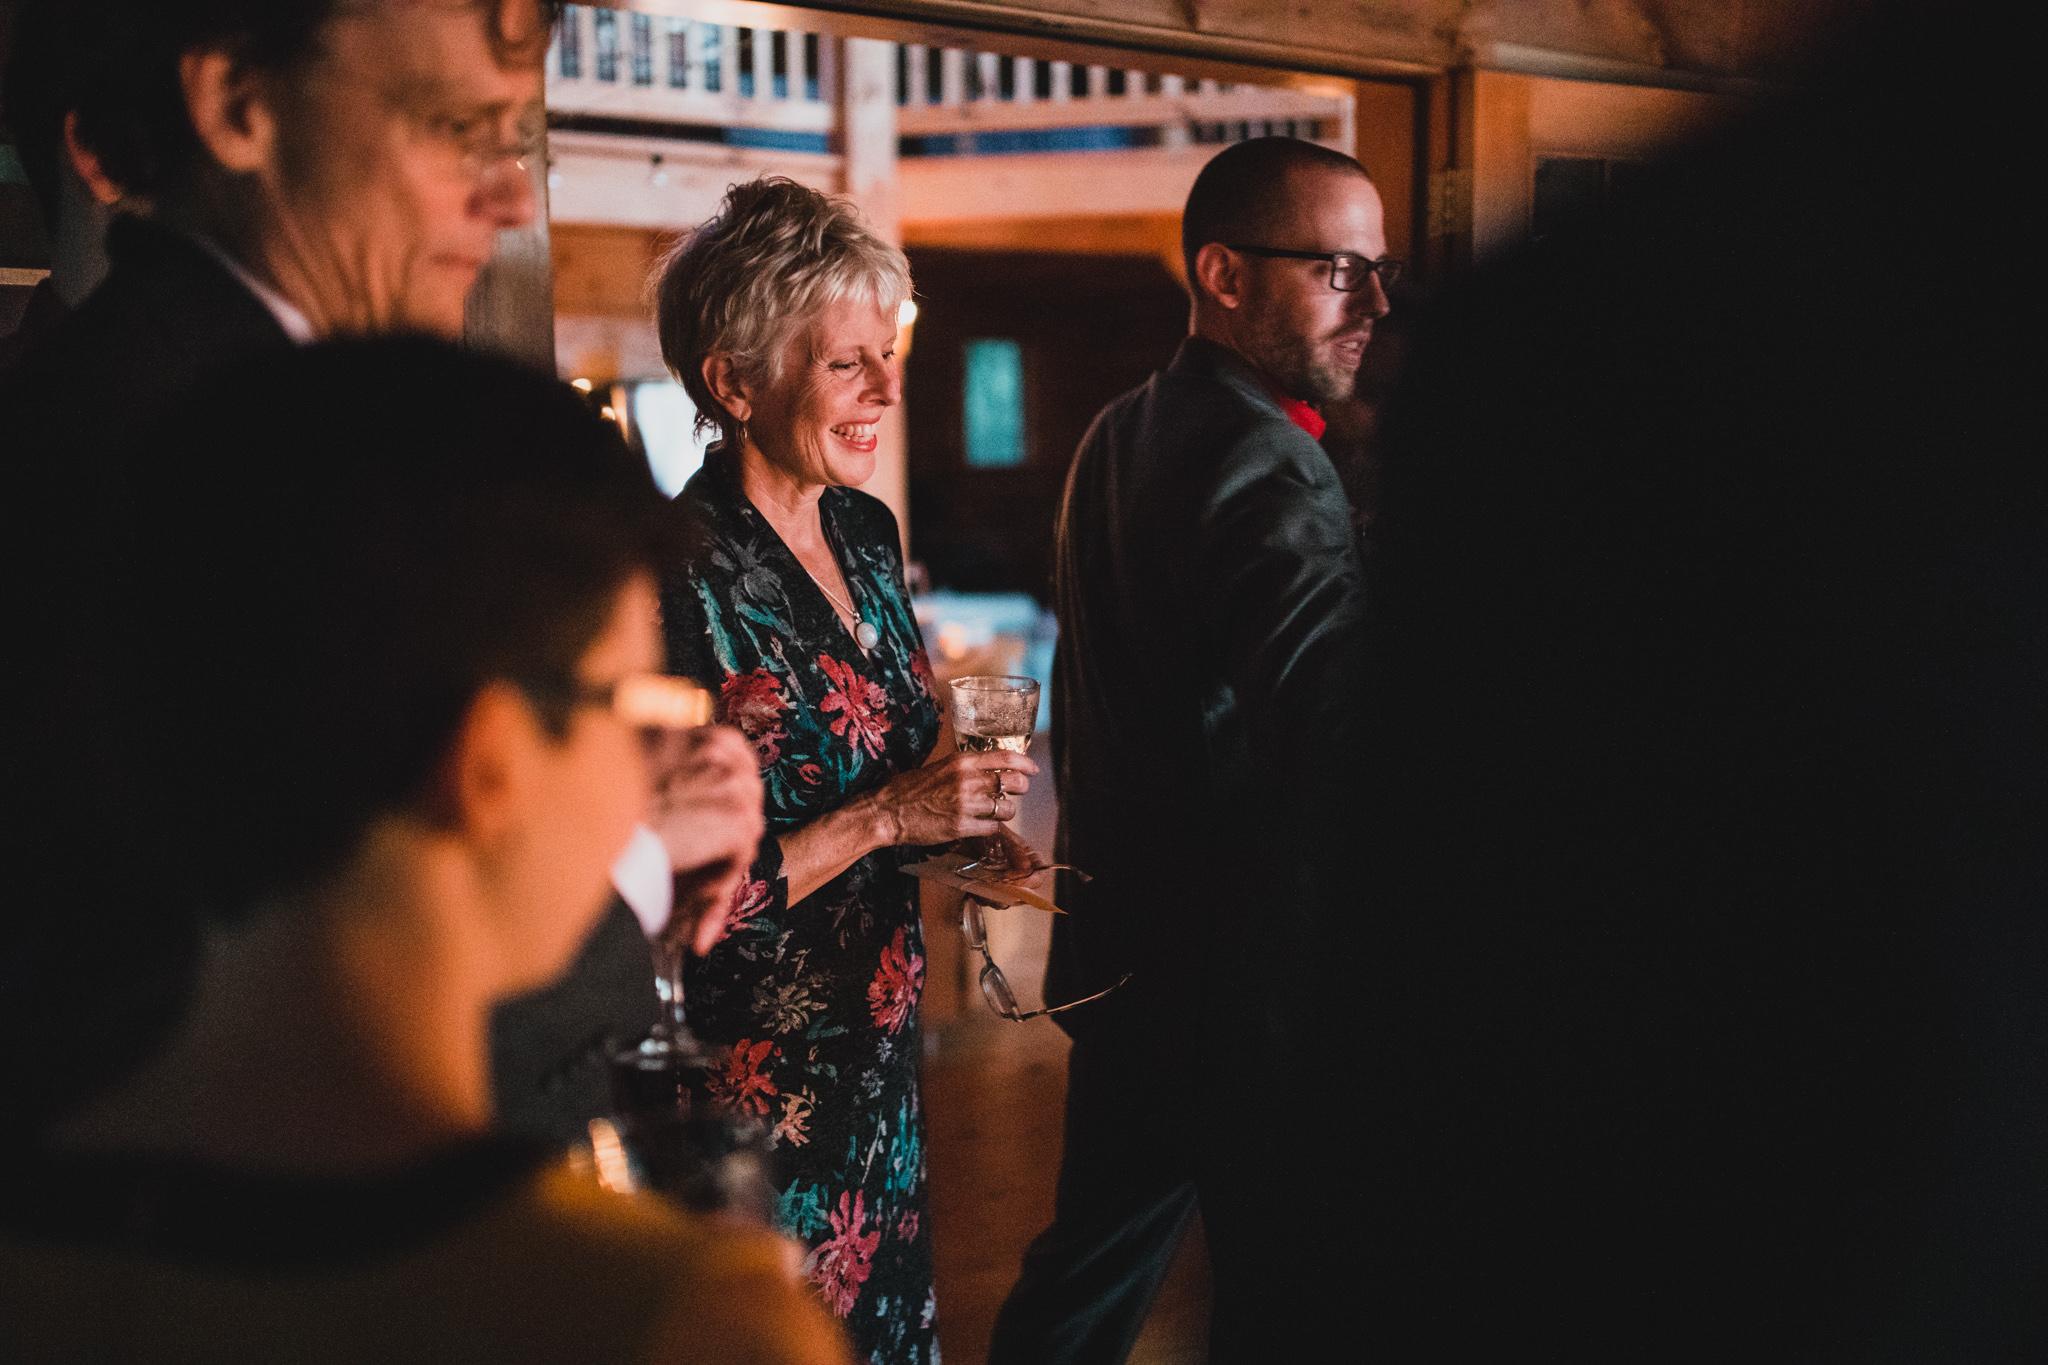 Elopement, intimate wedding